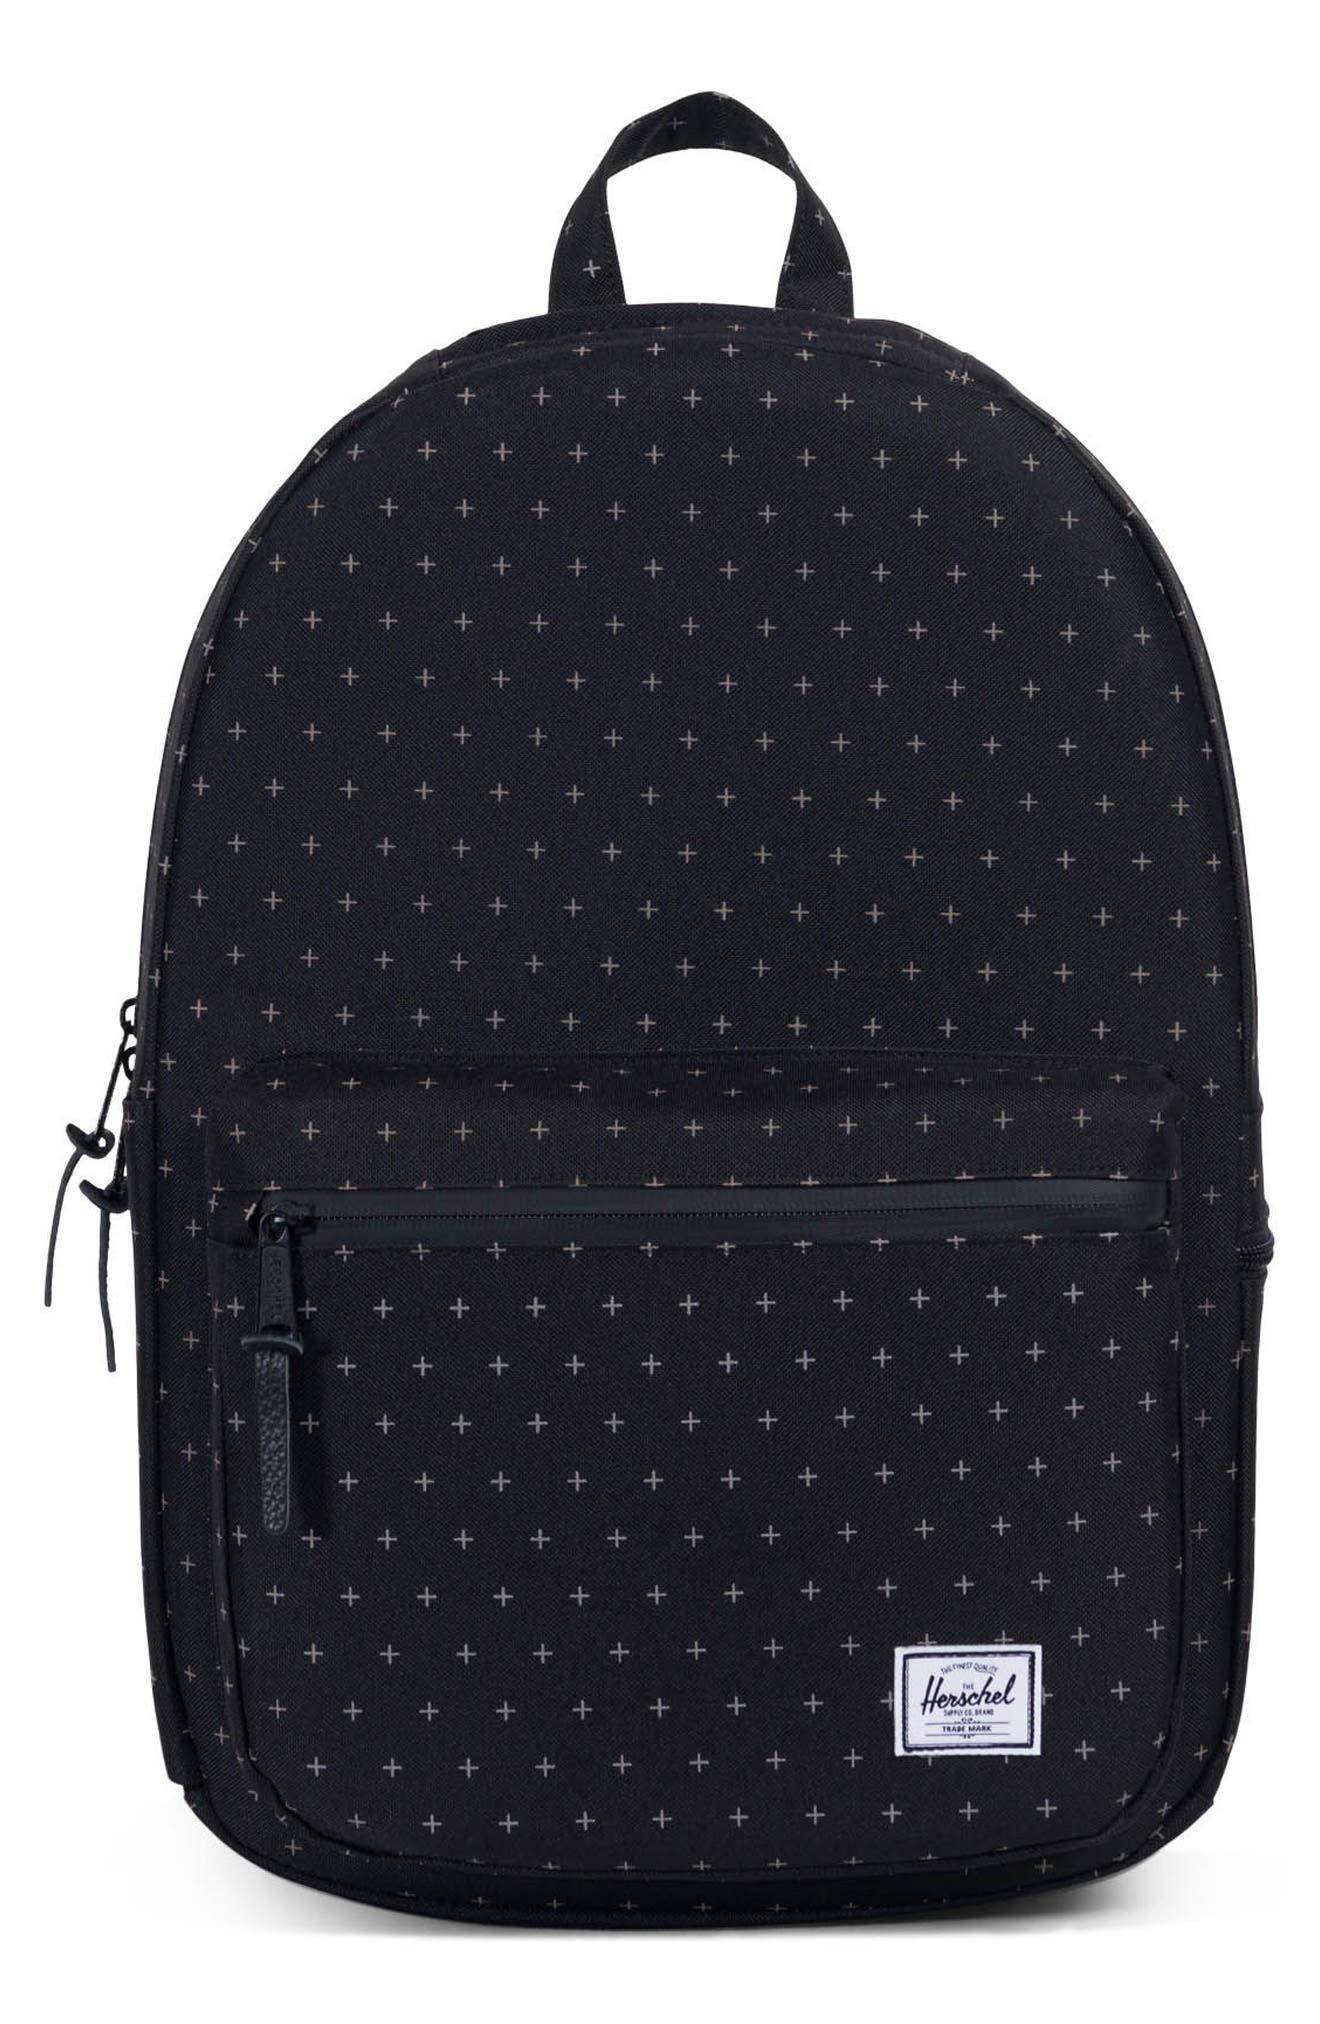 Harrison Backpack,                             Main thumbnail 1, color,                             Black Gridlock